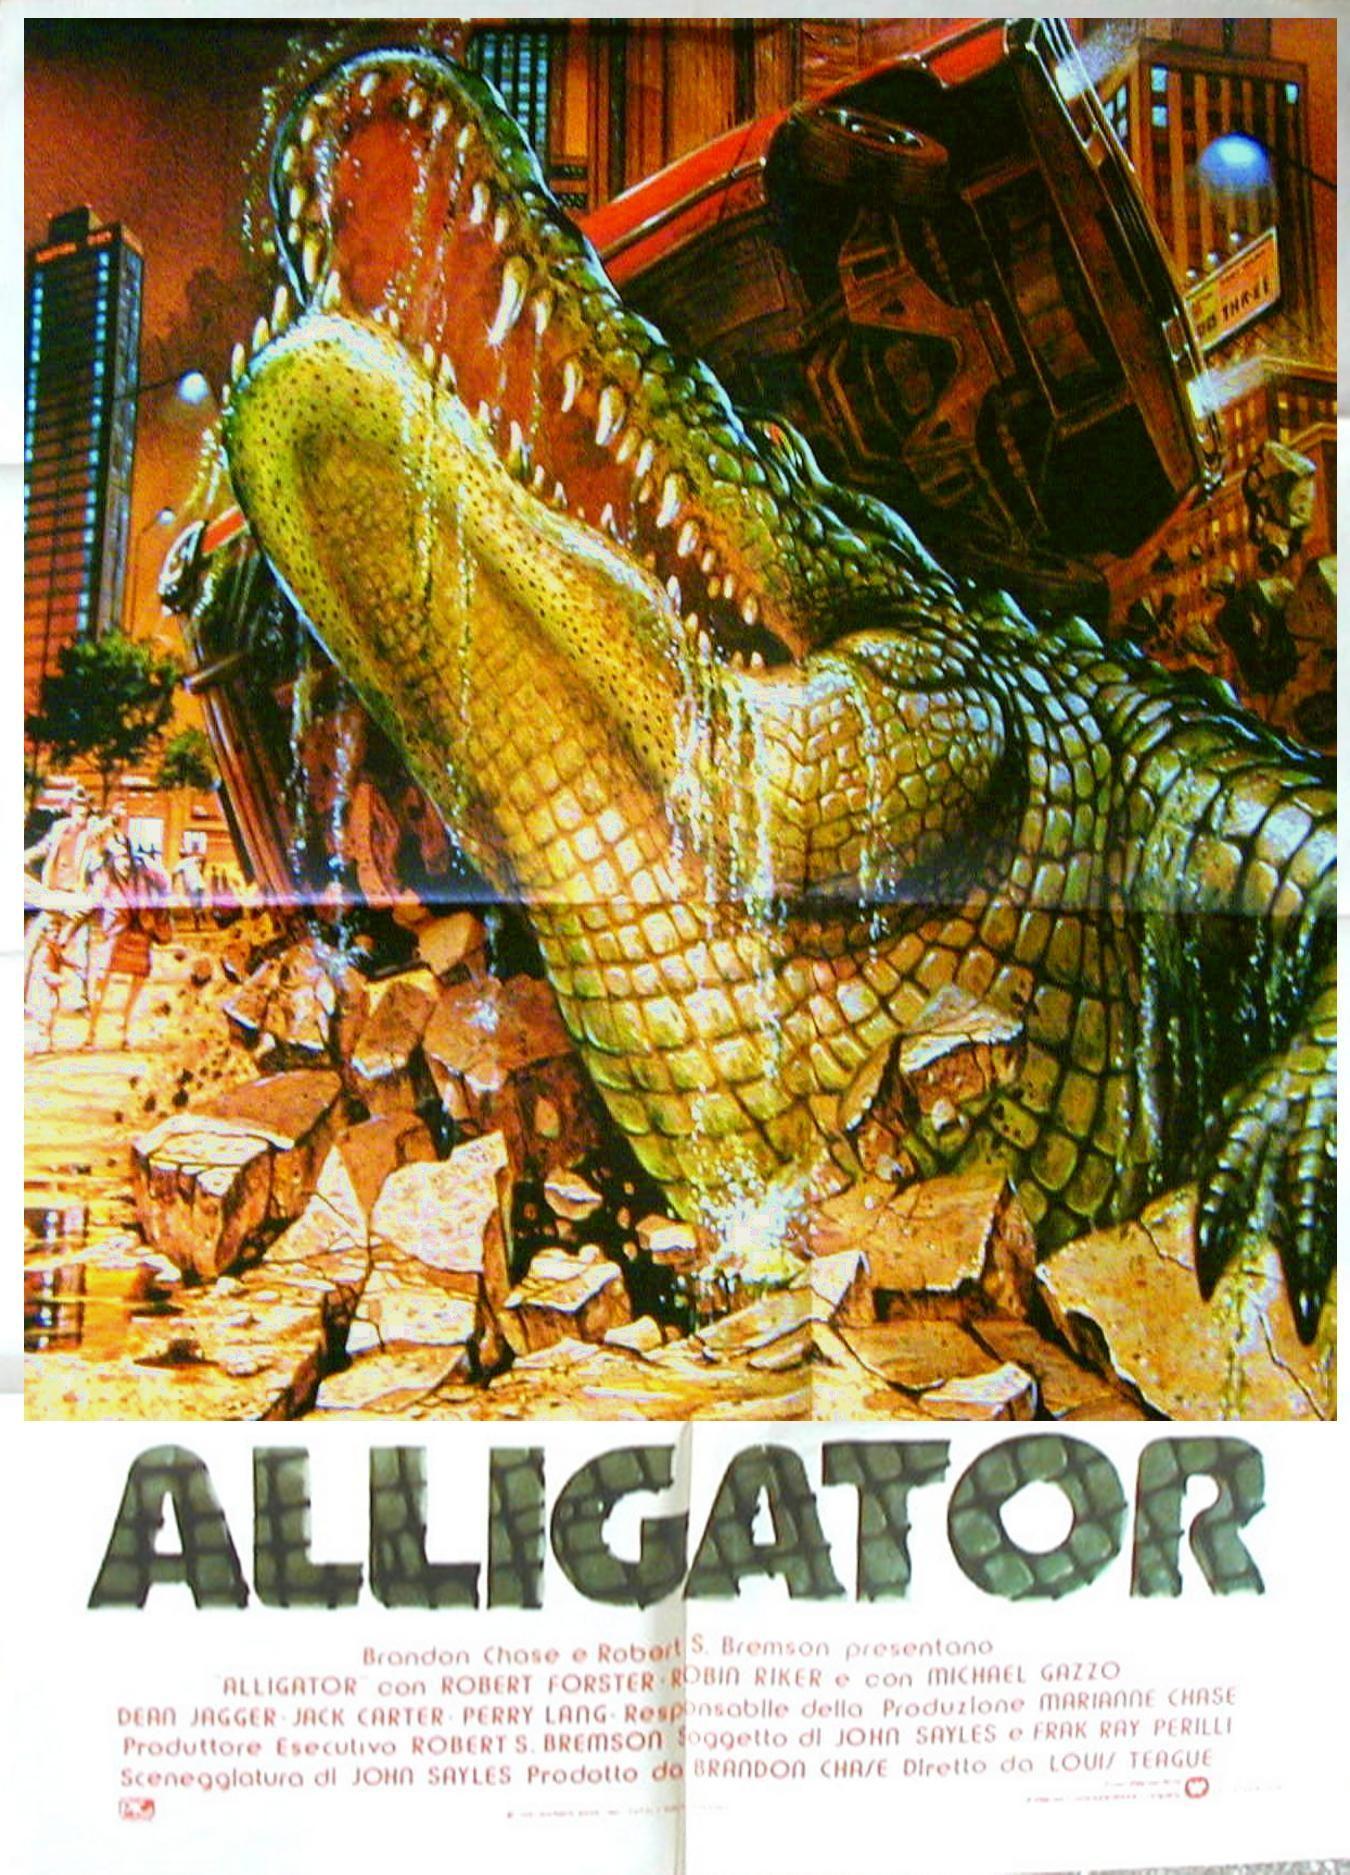 alligator 1980 in one